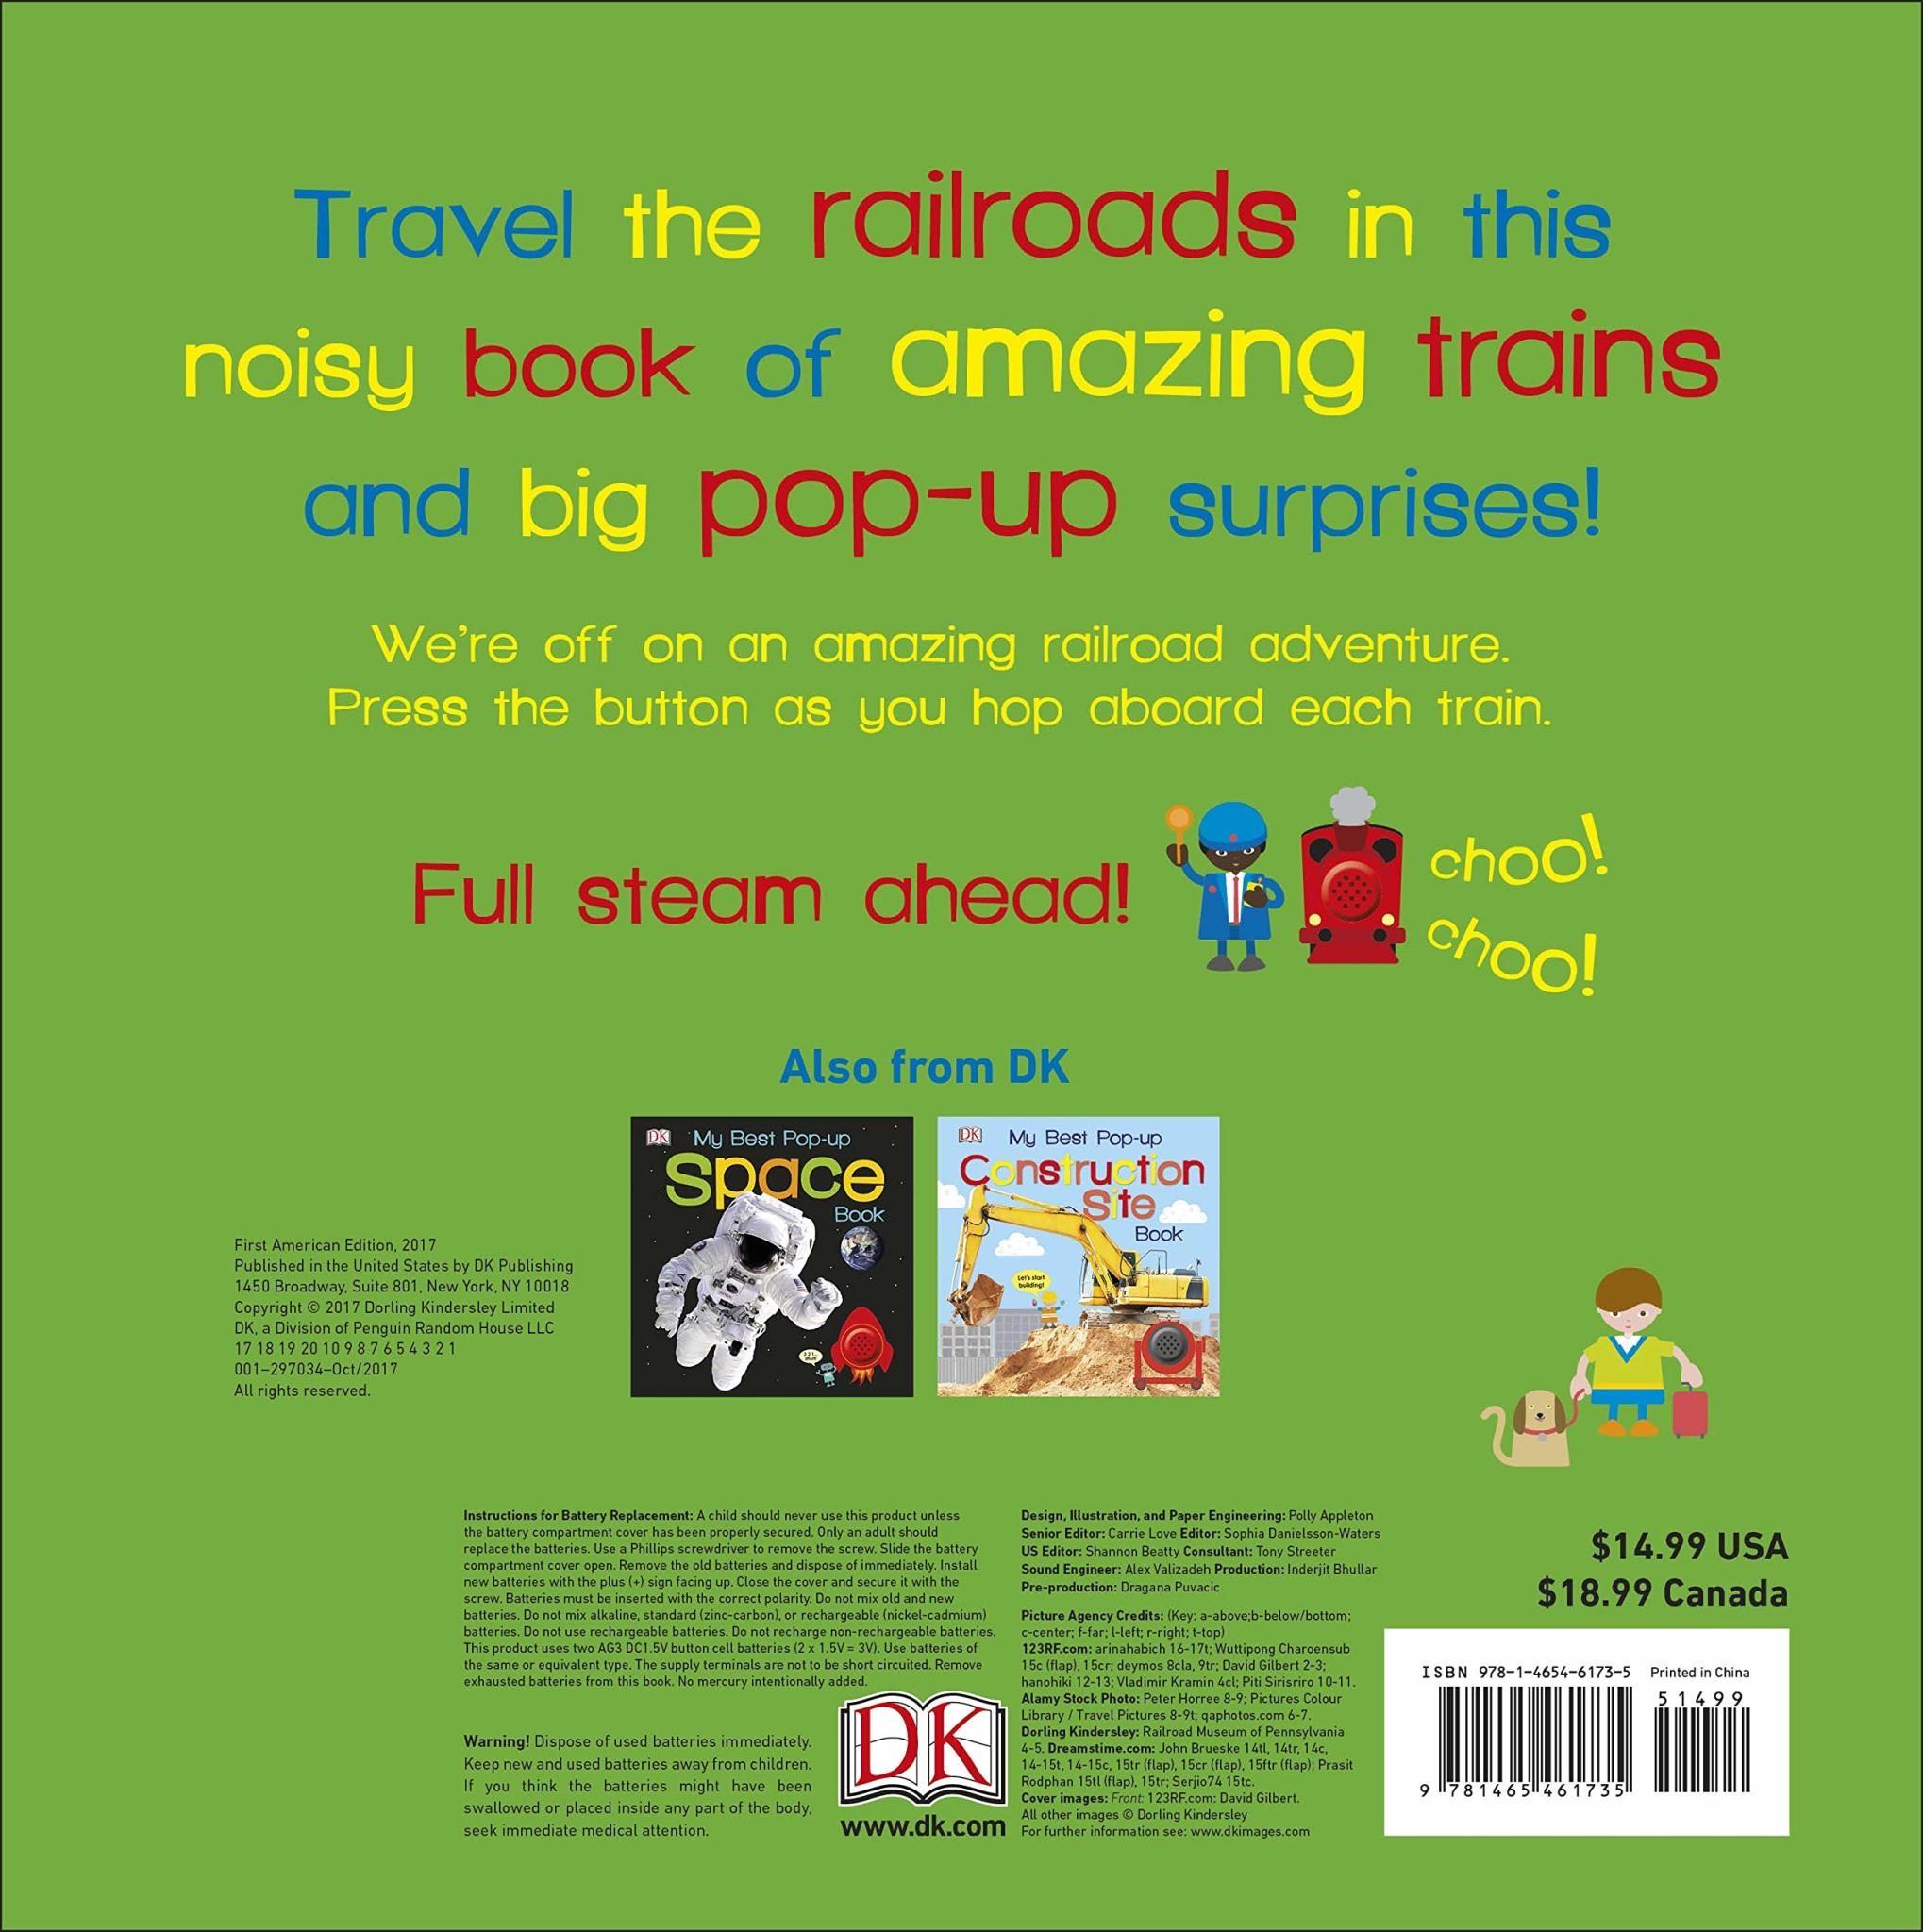 My Best Pop-up Noisy Train